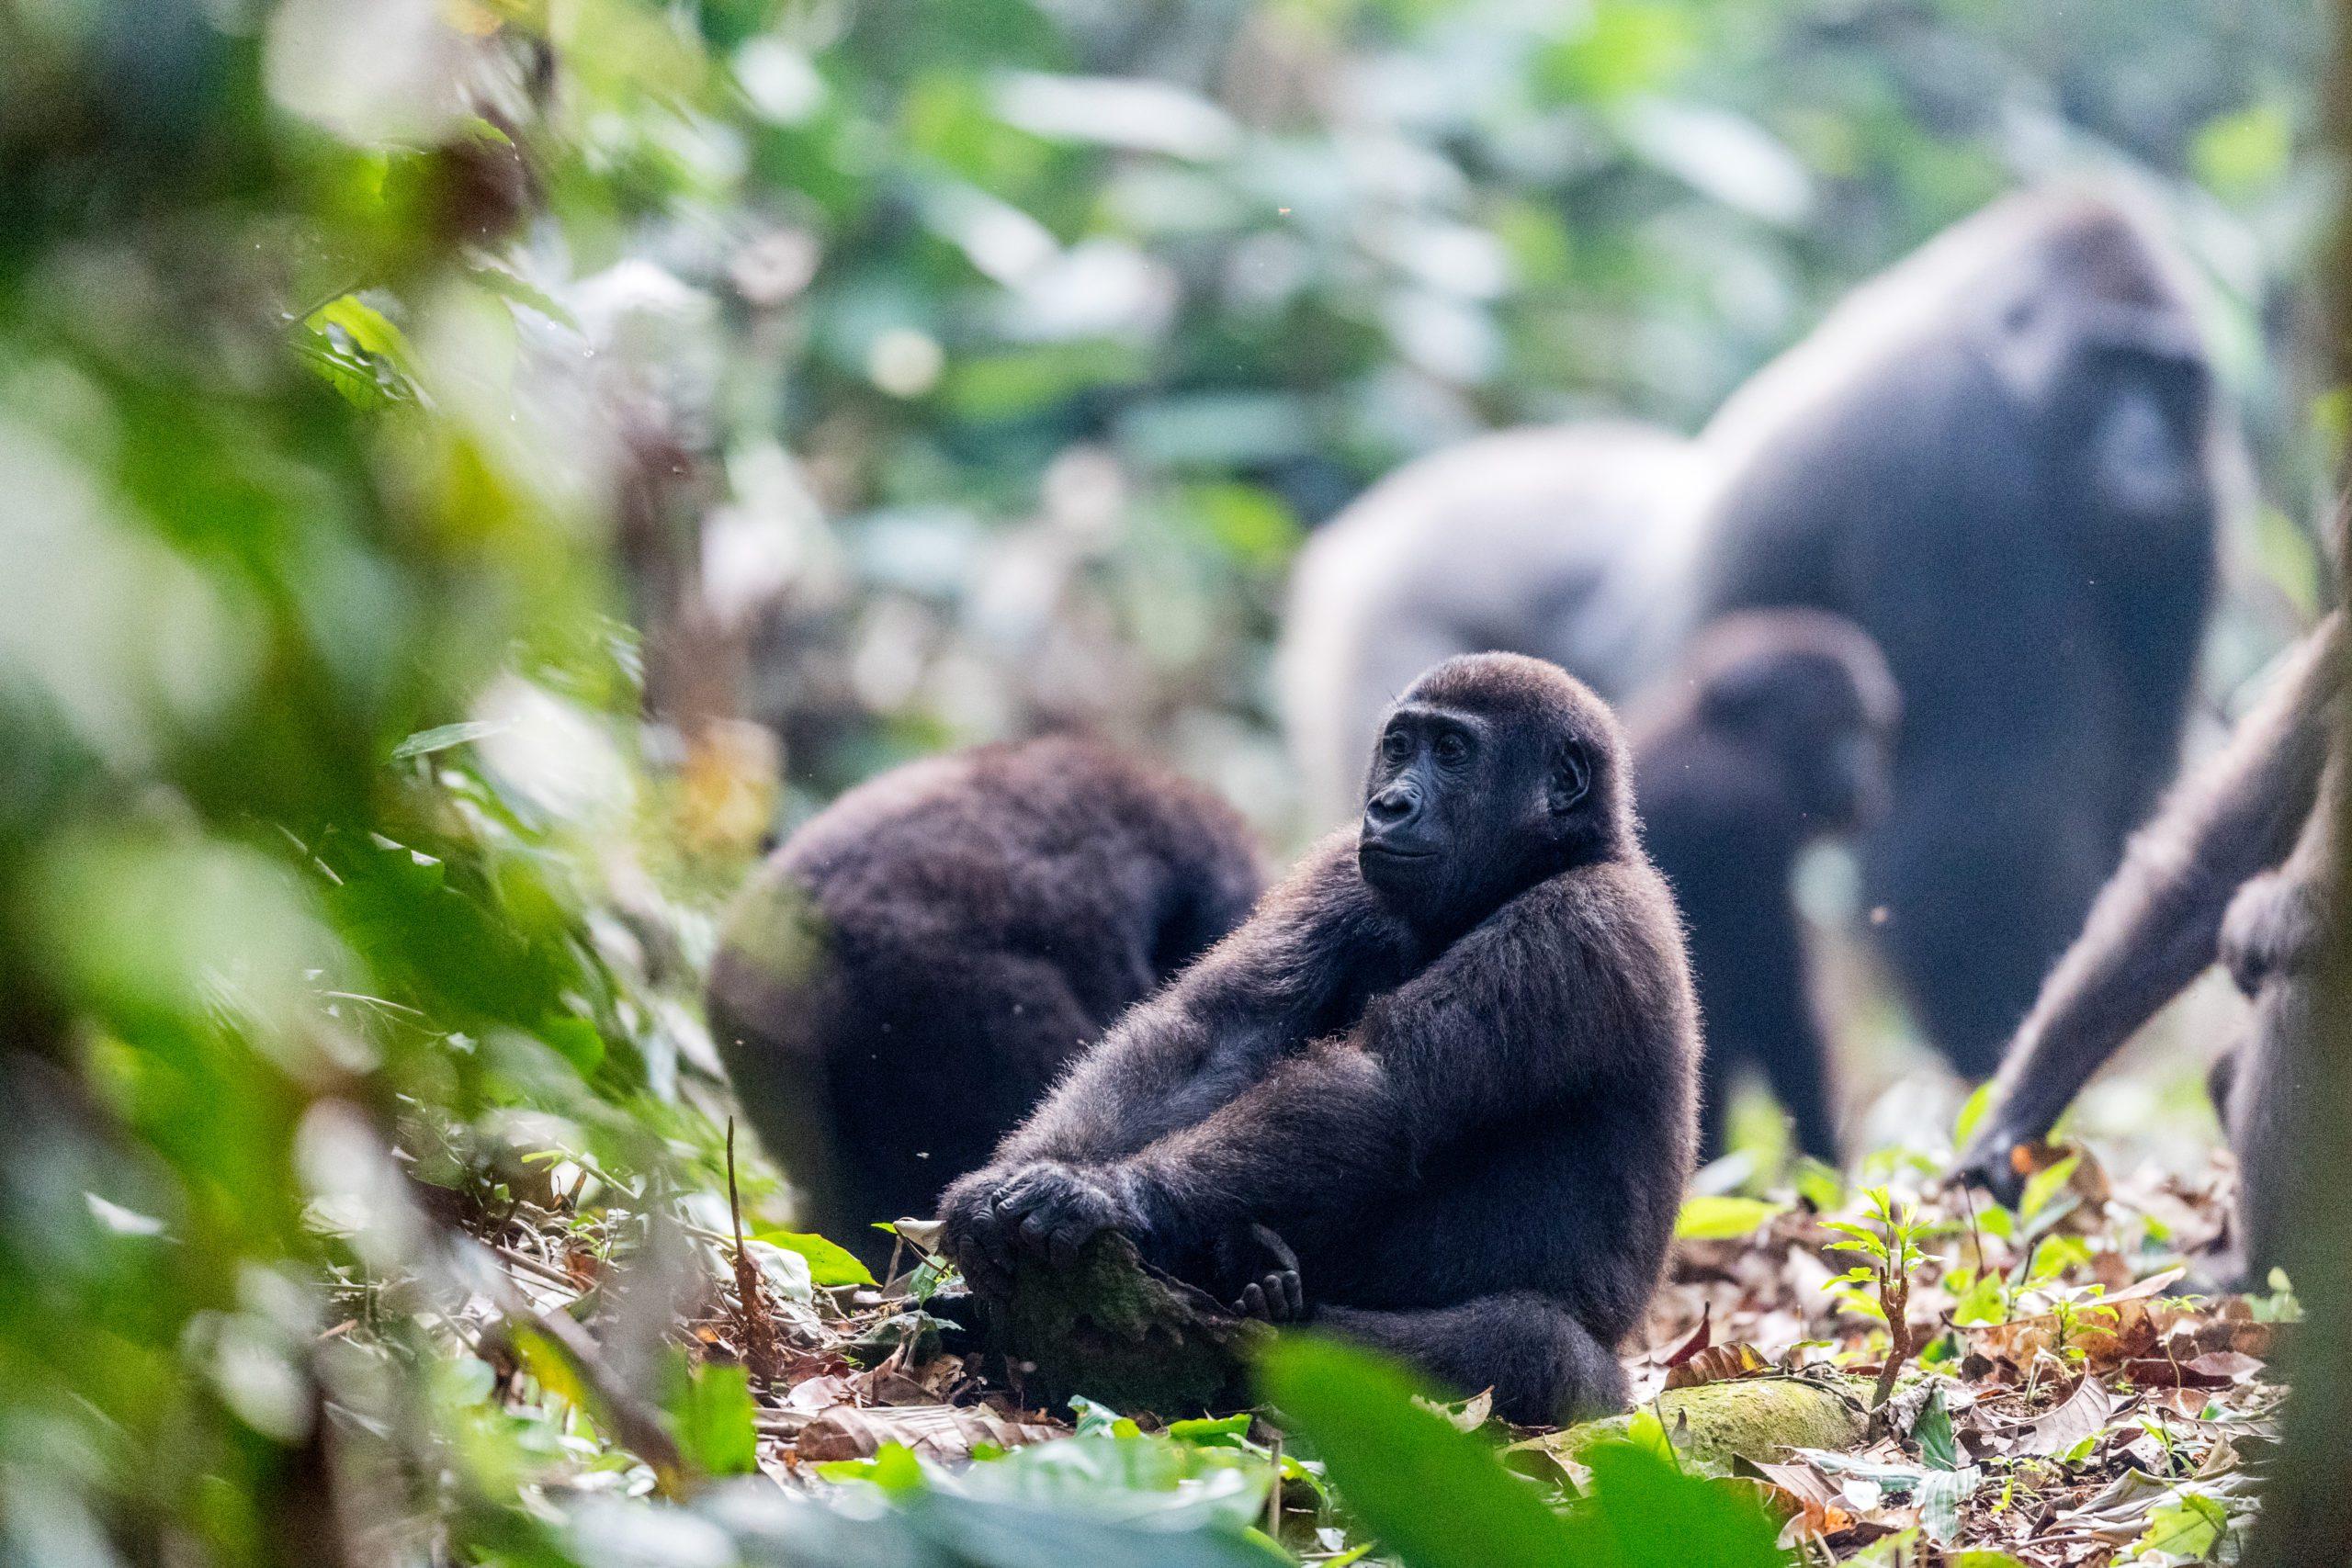 Congo Gorilla Ngaga Camp gorilla sitting with other gorillas